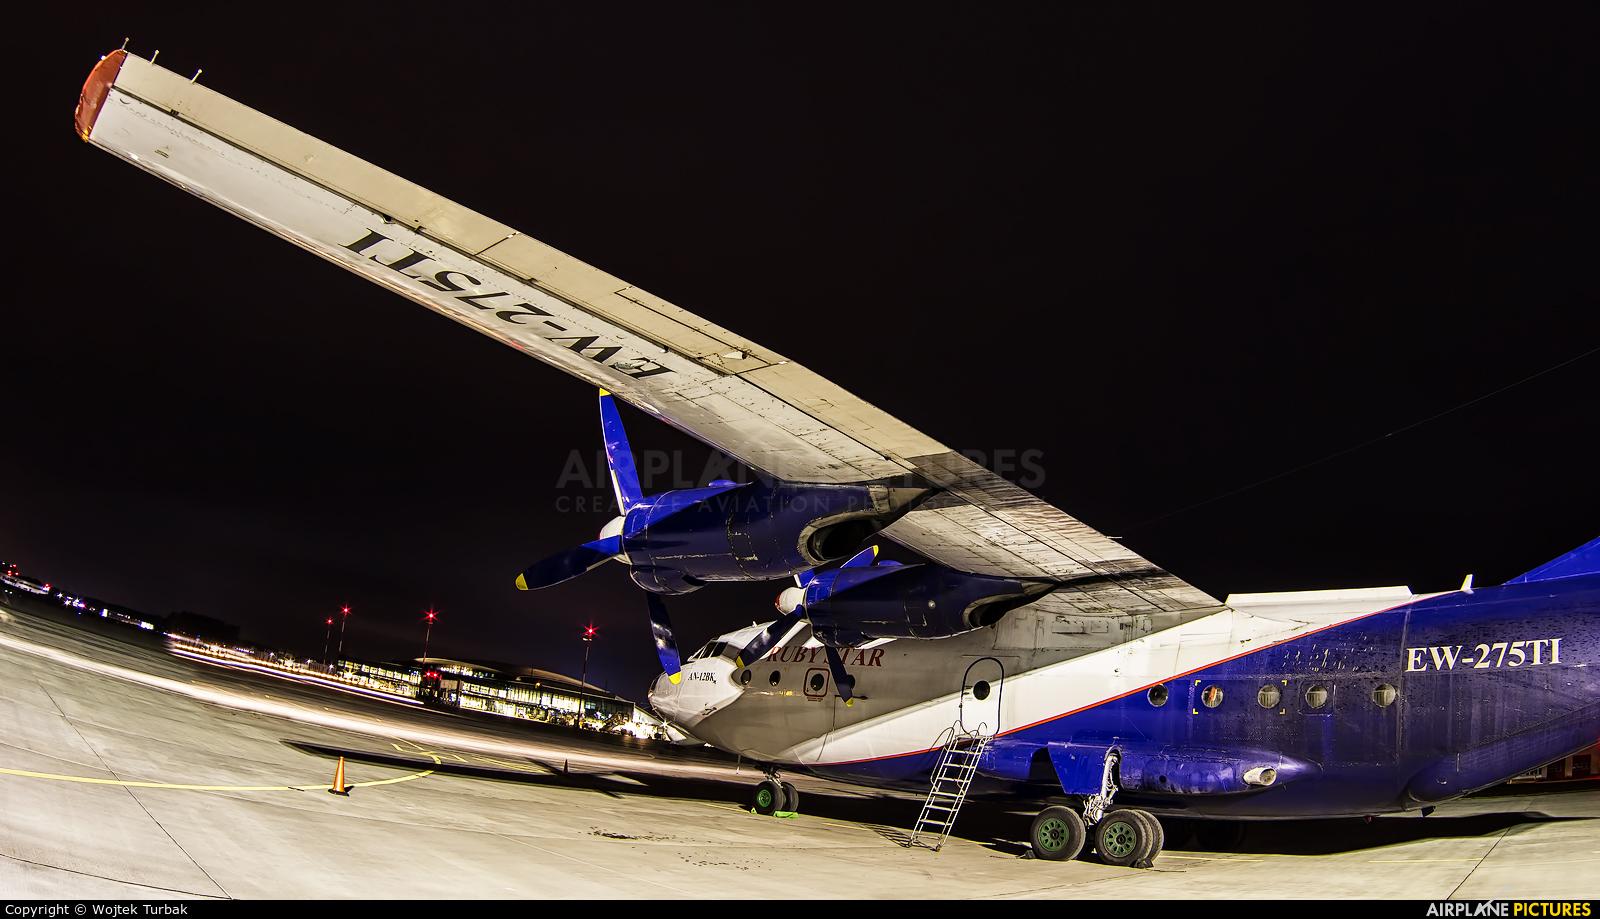 Ruby Star Air Enterprise EW275TI aircraft at Rzeszów-Jasionka